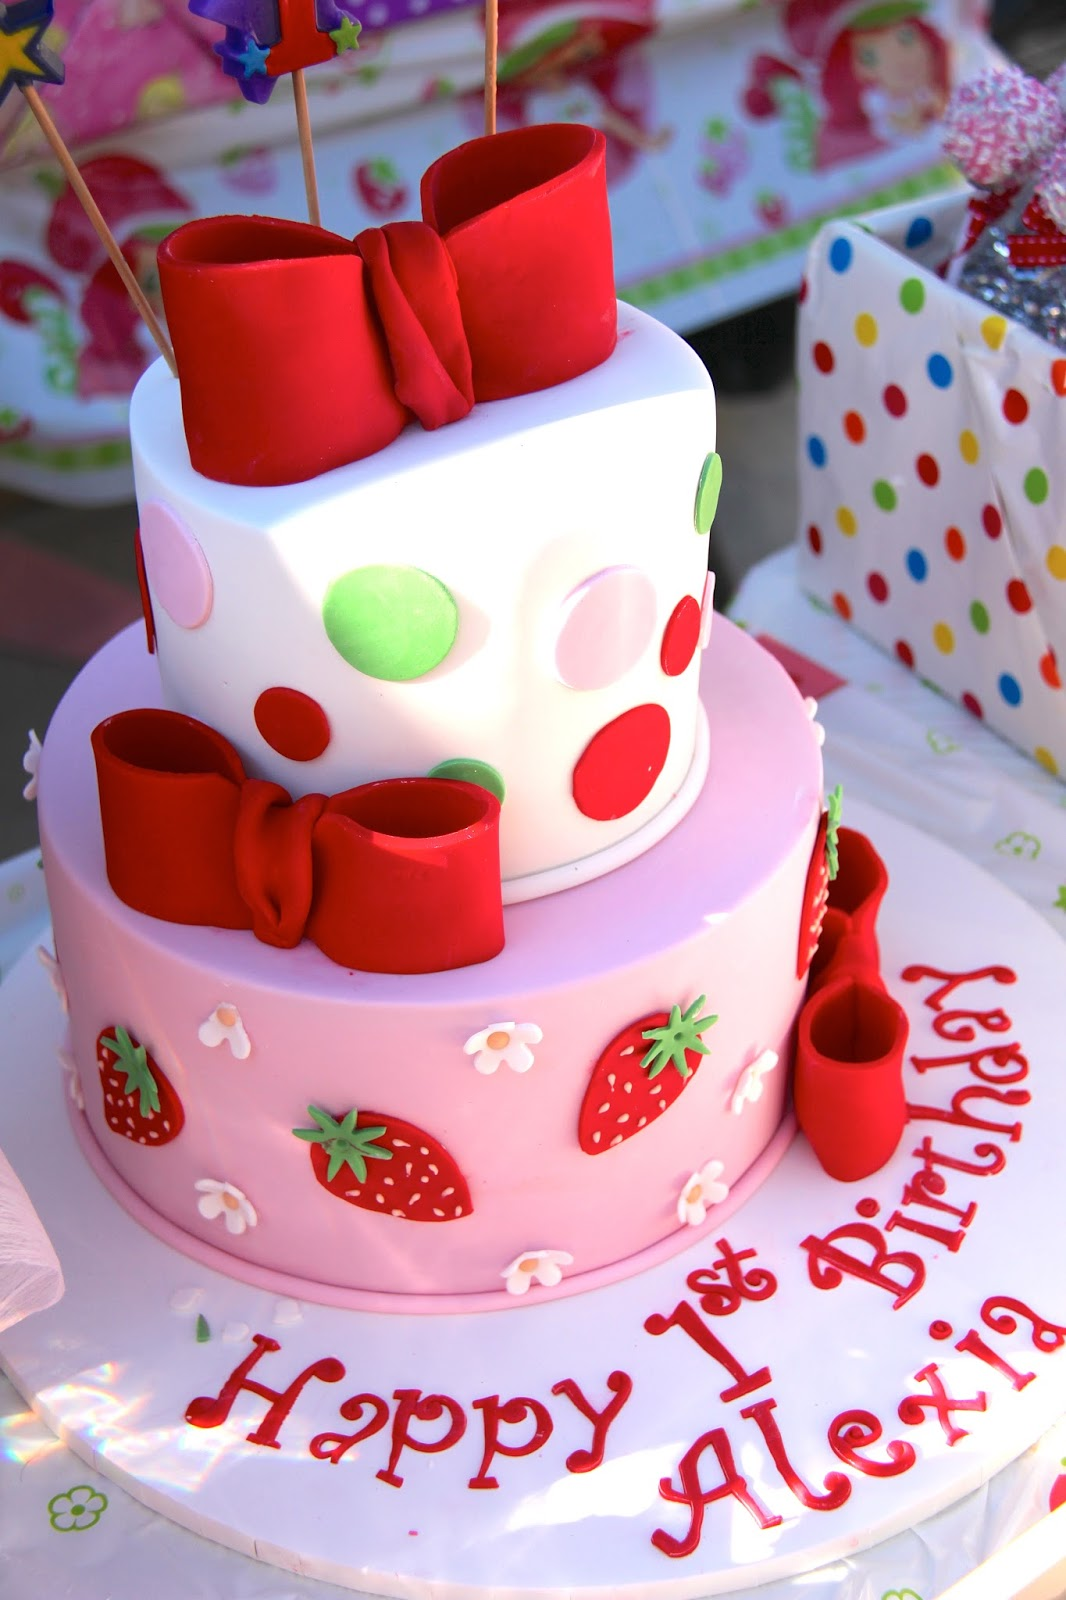 Party Ideas Strawberry Shortcake Themed Birthday And Diy Lemonade